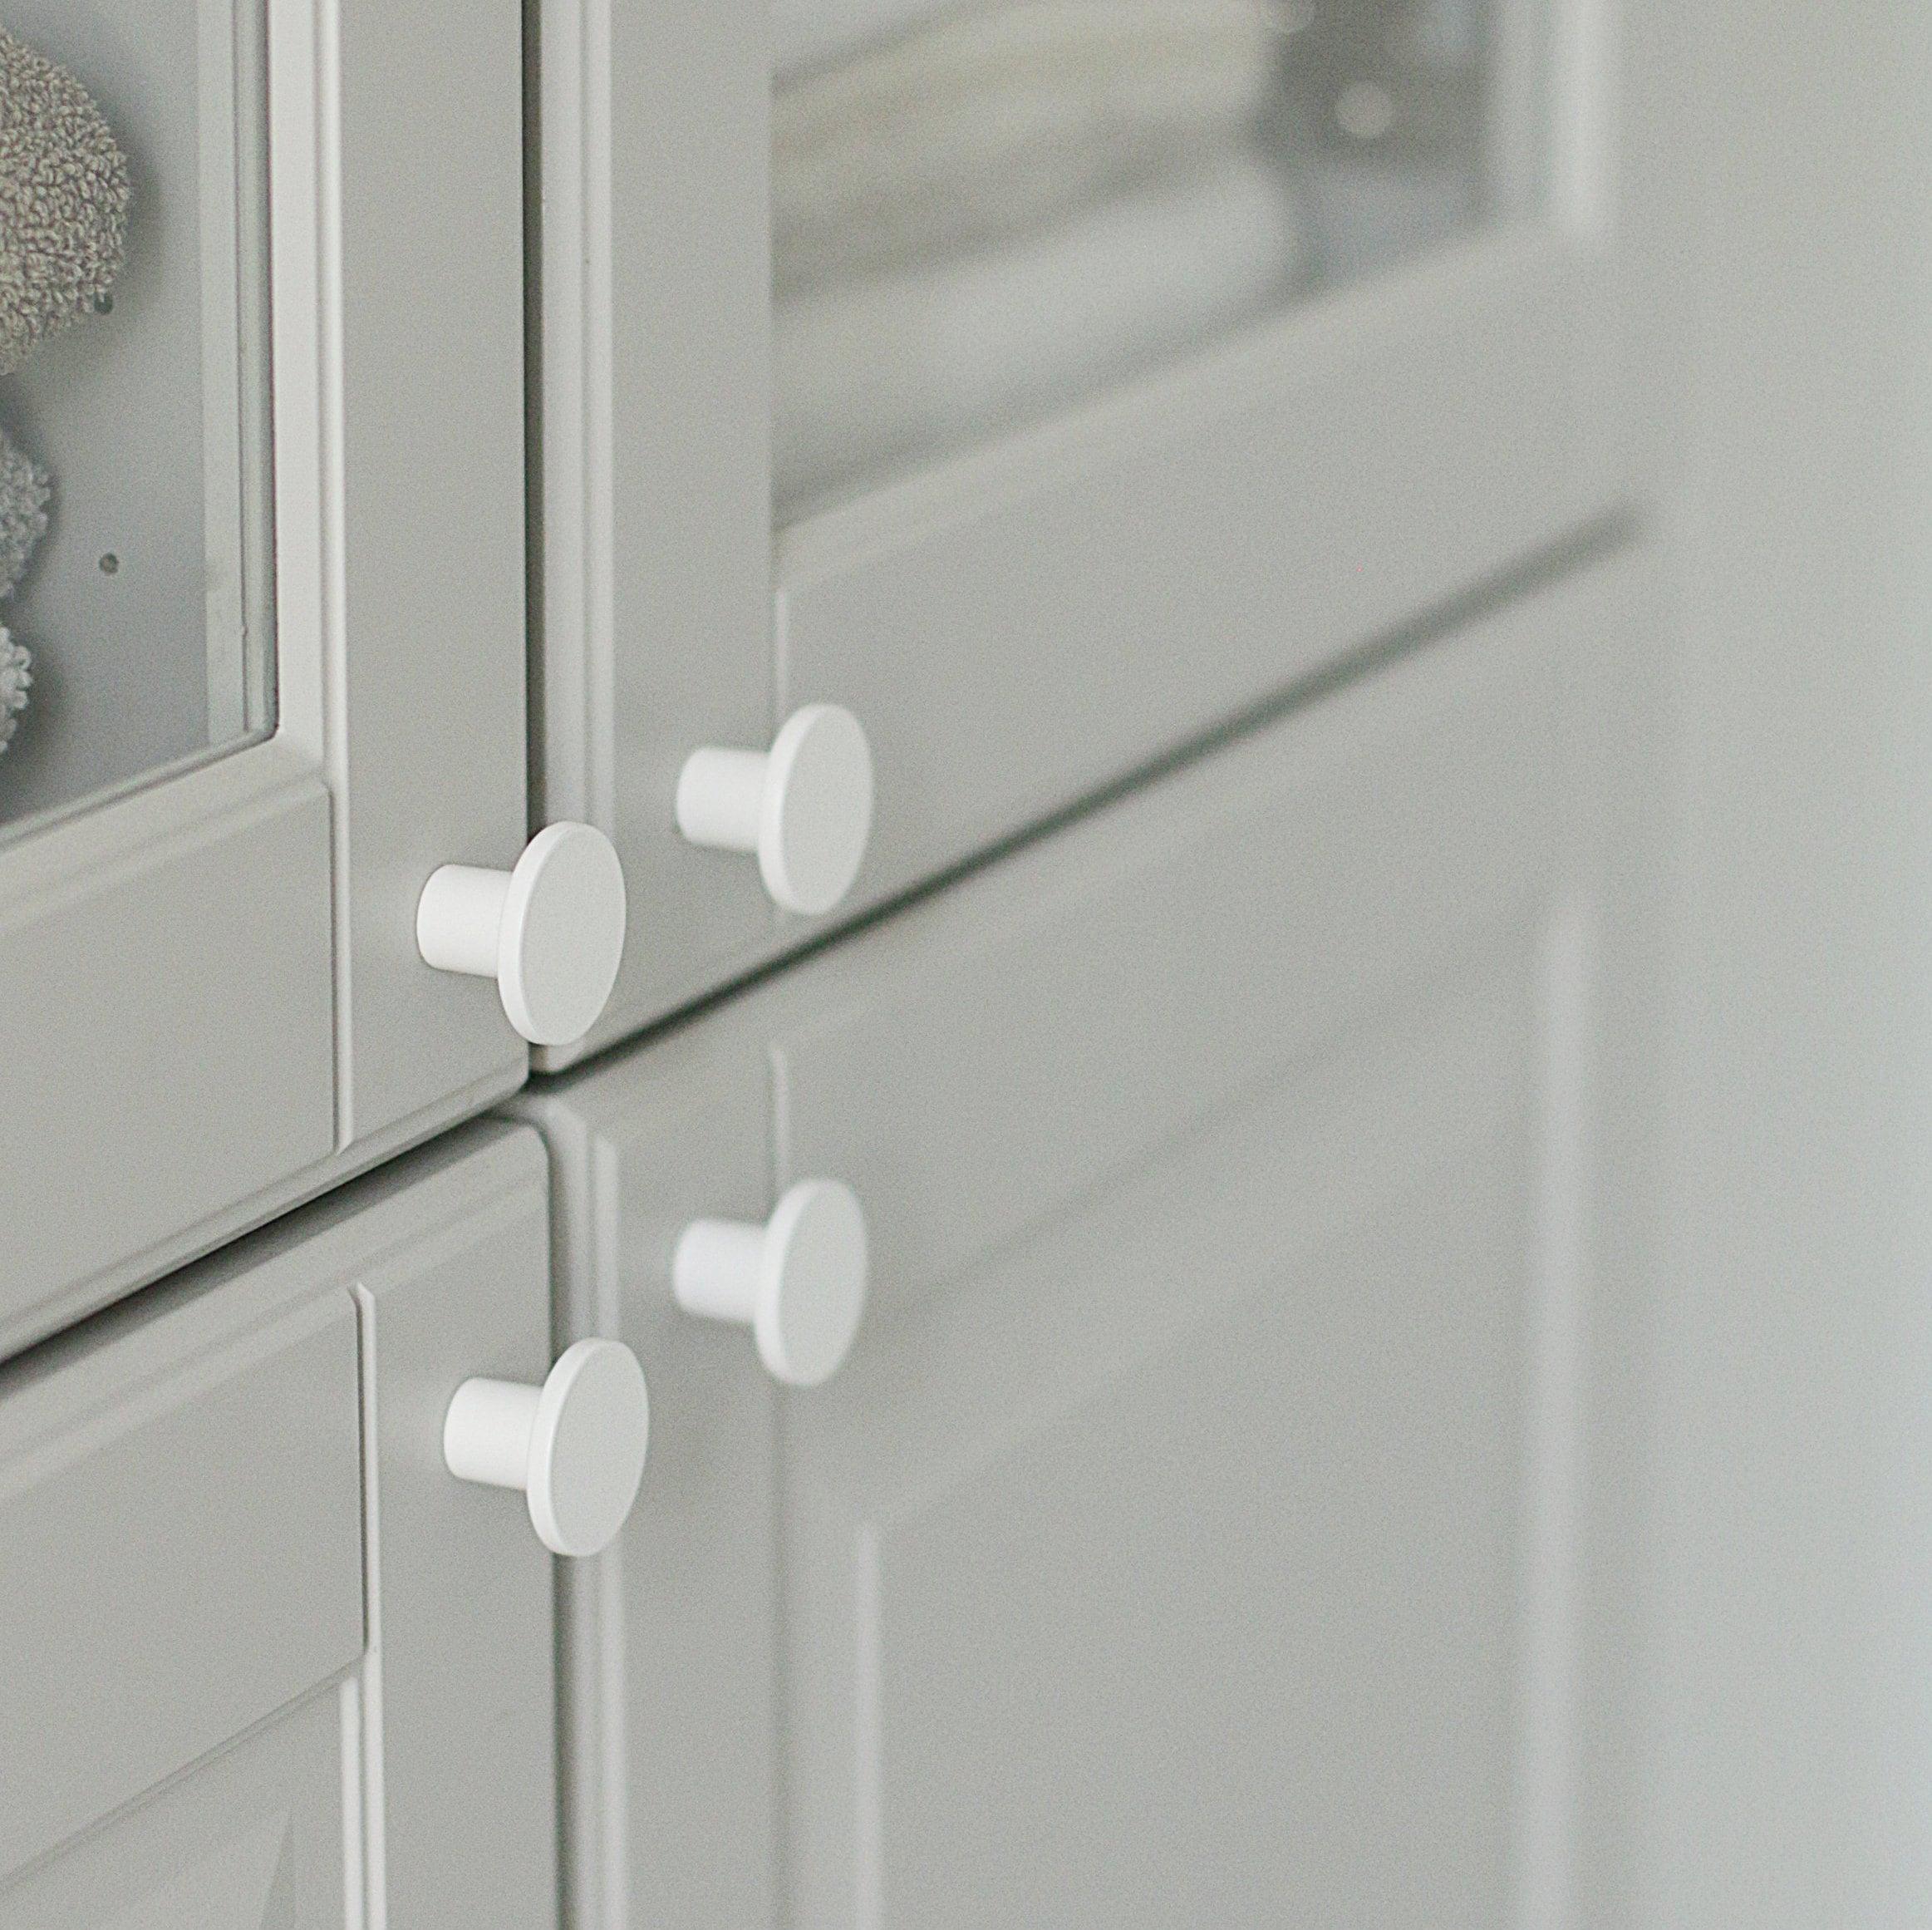 Cooper Modern Pulls White Knob Cabinet Drawer Knob Round Etsy